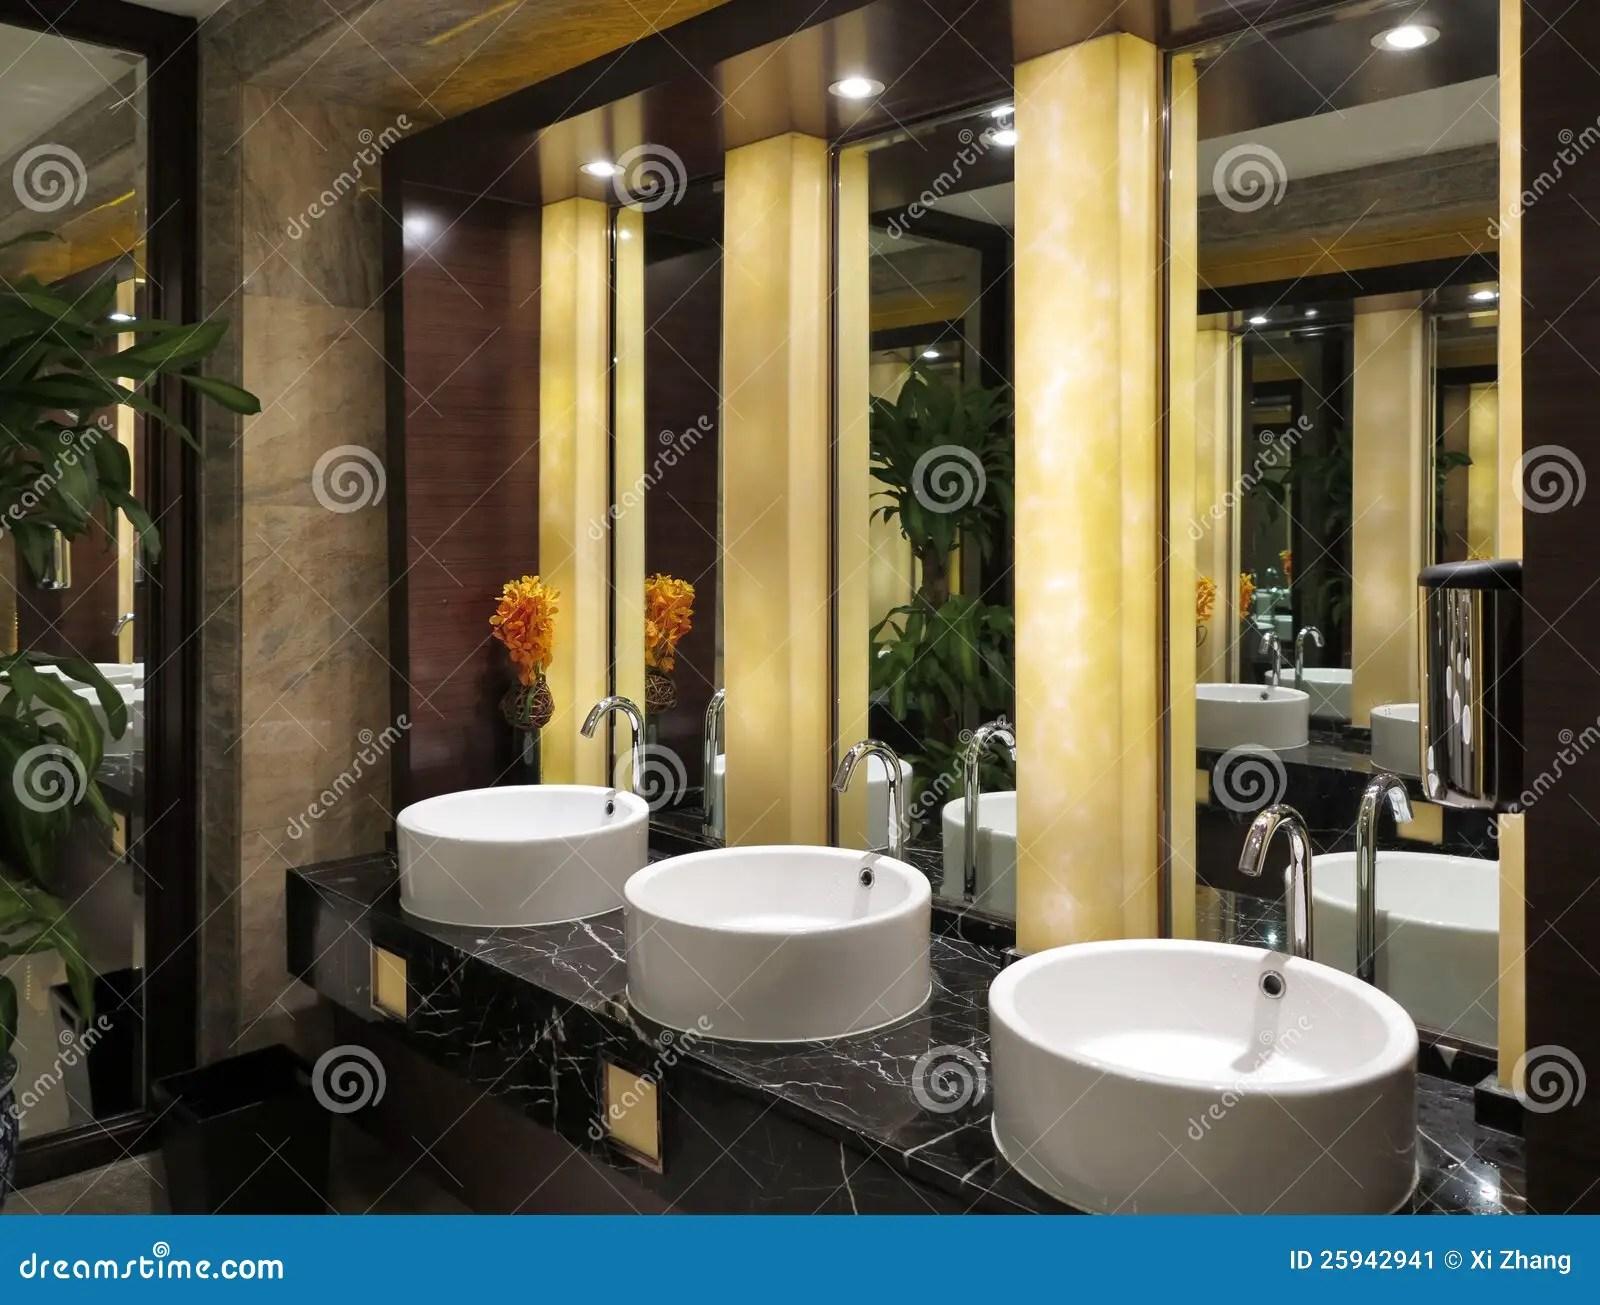 Toilet Sinks Mirror Stock Image Image 25942941